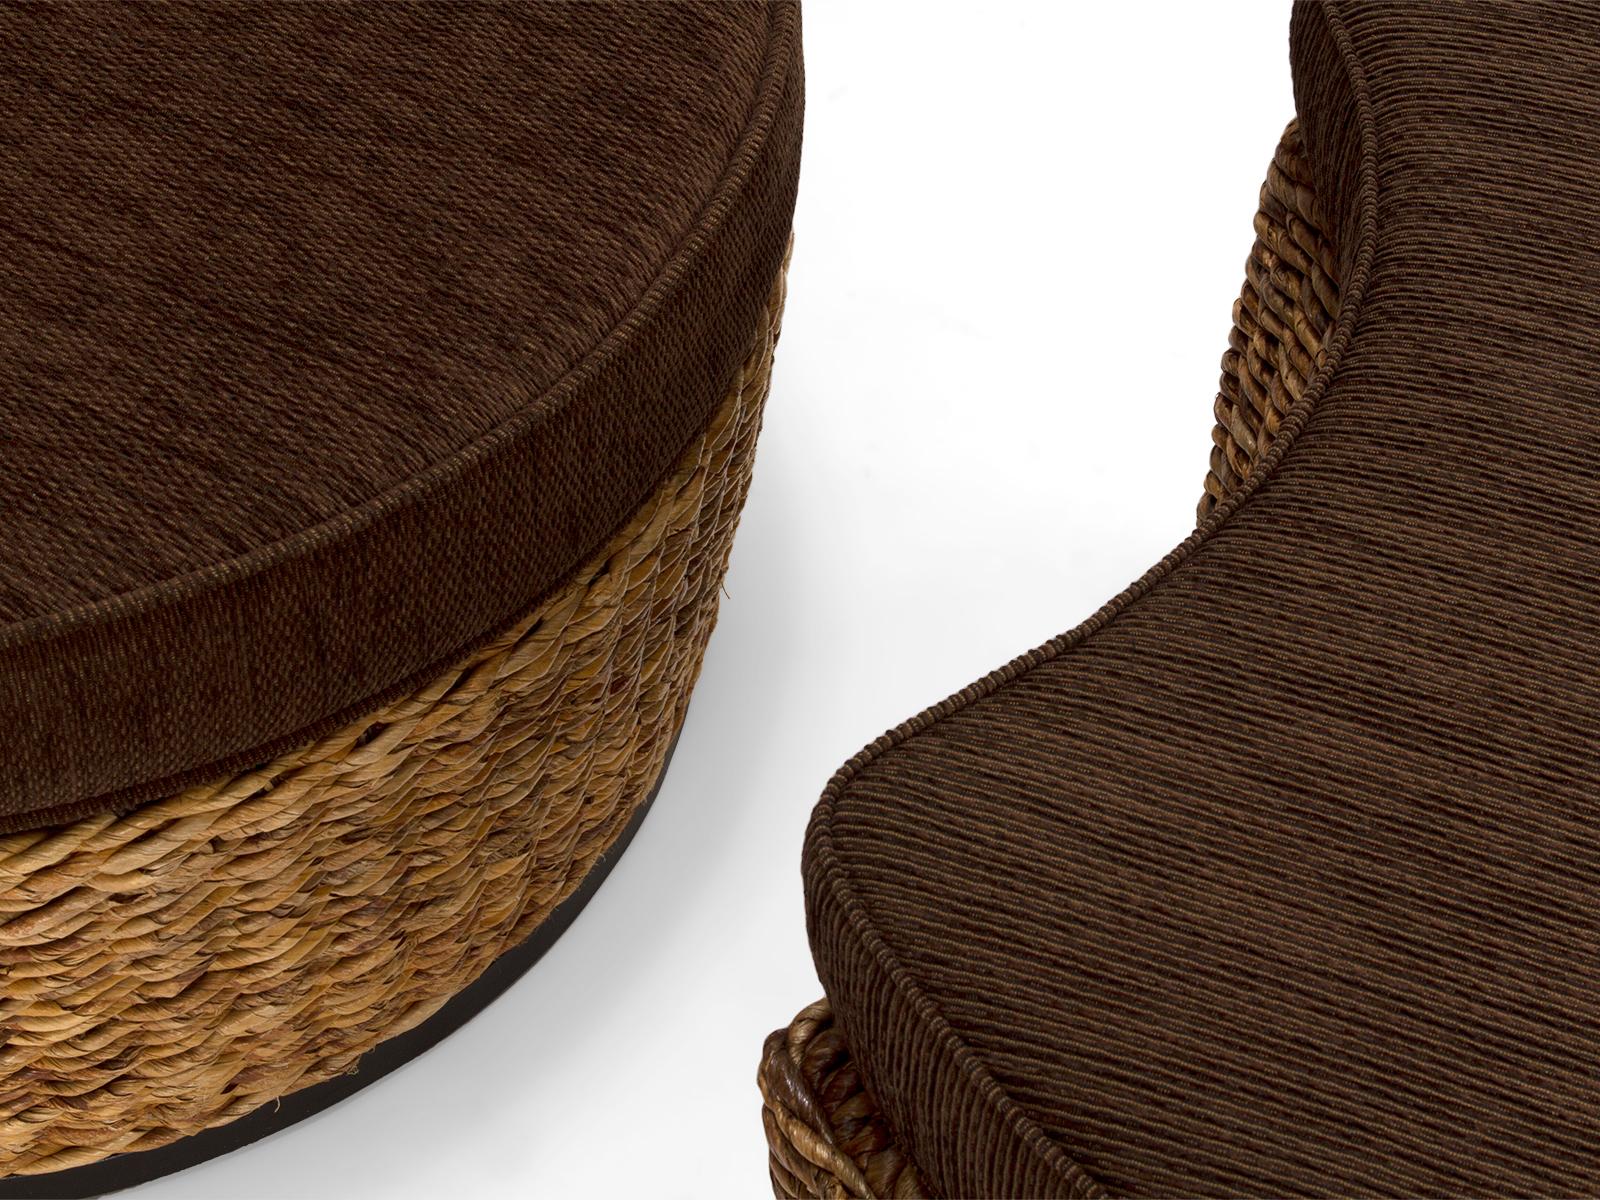 geflechtsessel banana mit hocker rattan korbhaus. Black Bedroom Furniture Sets. Home Design Ideas